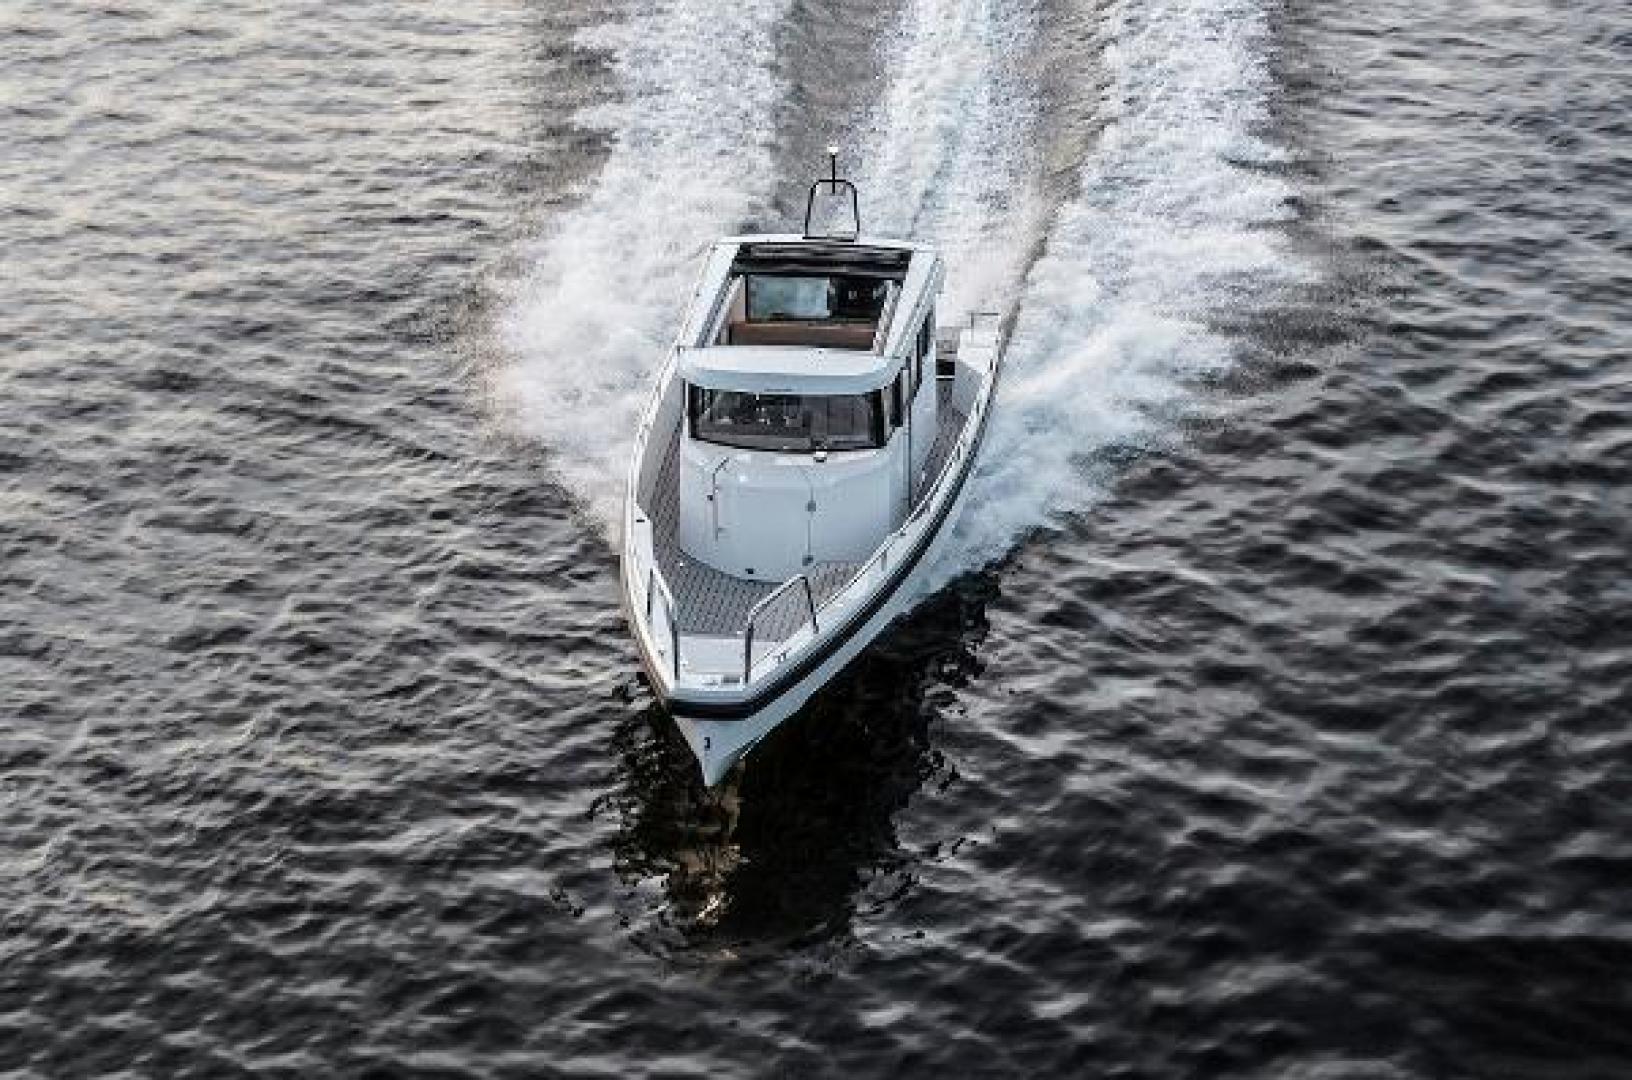 Axopar-28 CABIN 2020-Axopar 28 CABIN Sarasota-Florida-United States-1531528 | Thumbnail